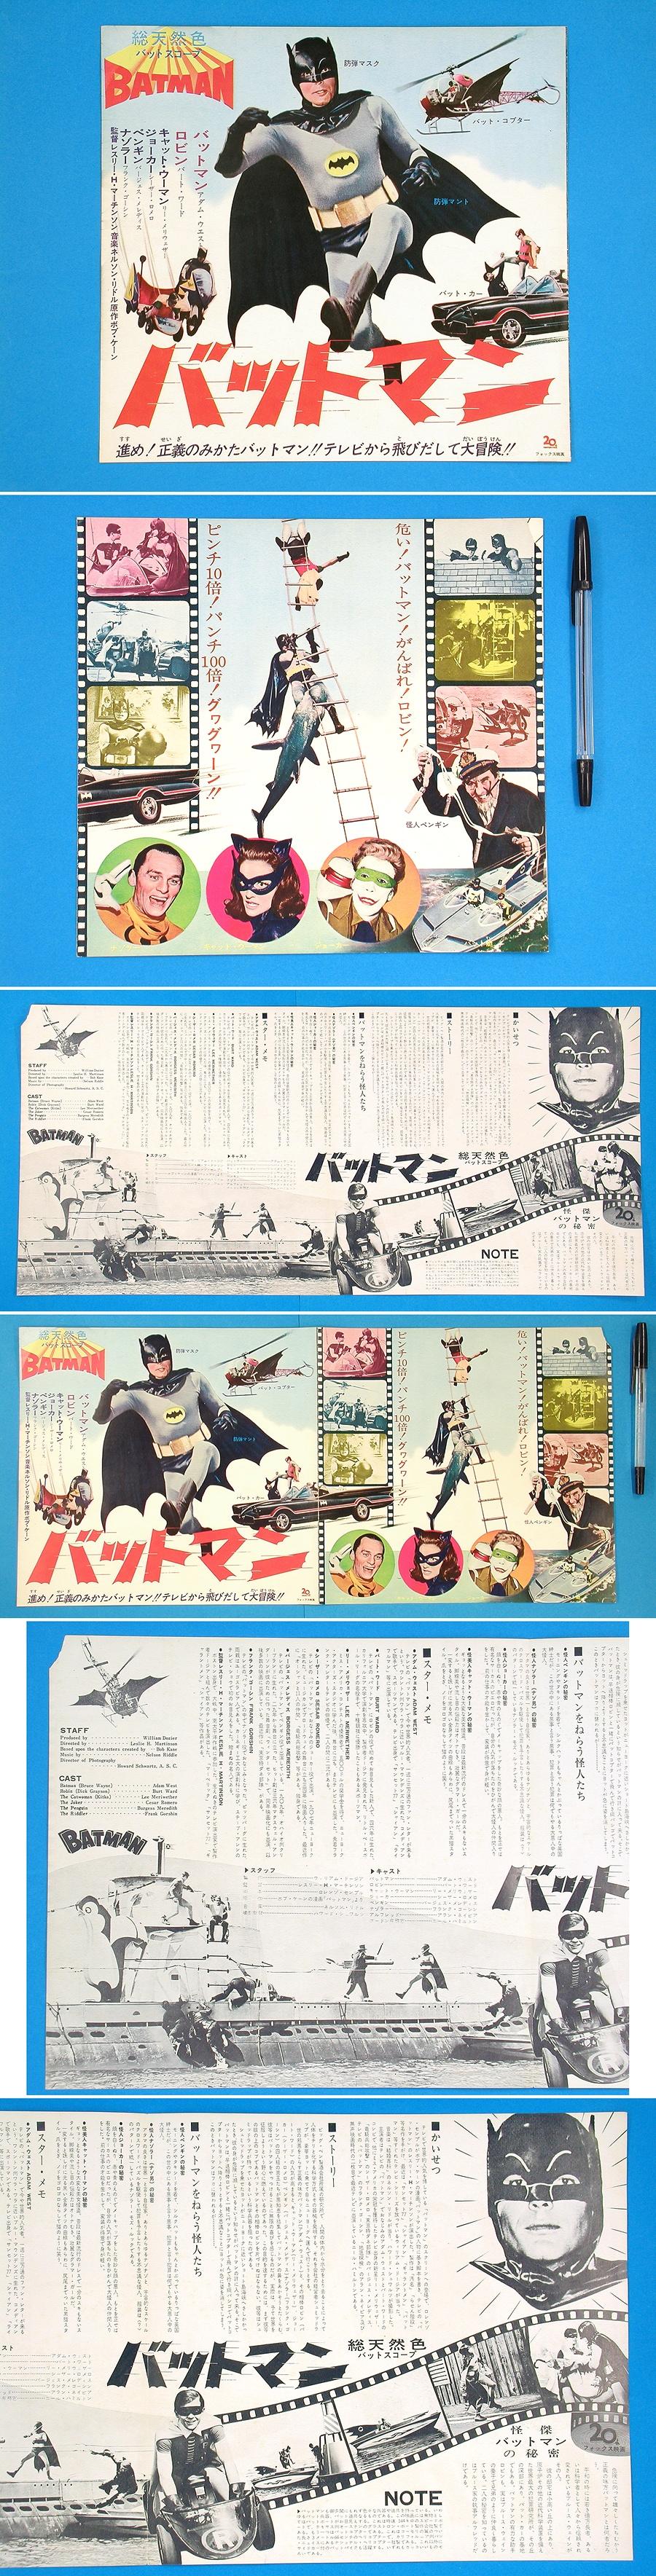 batman_japanpb